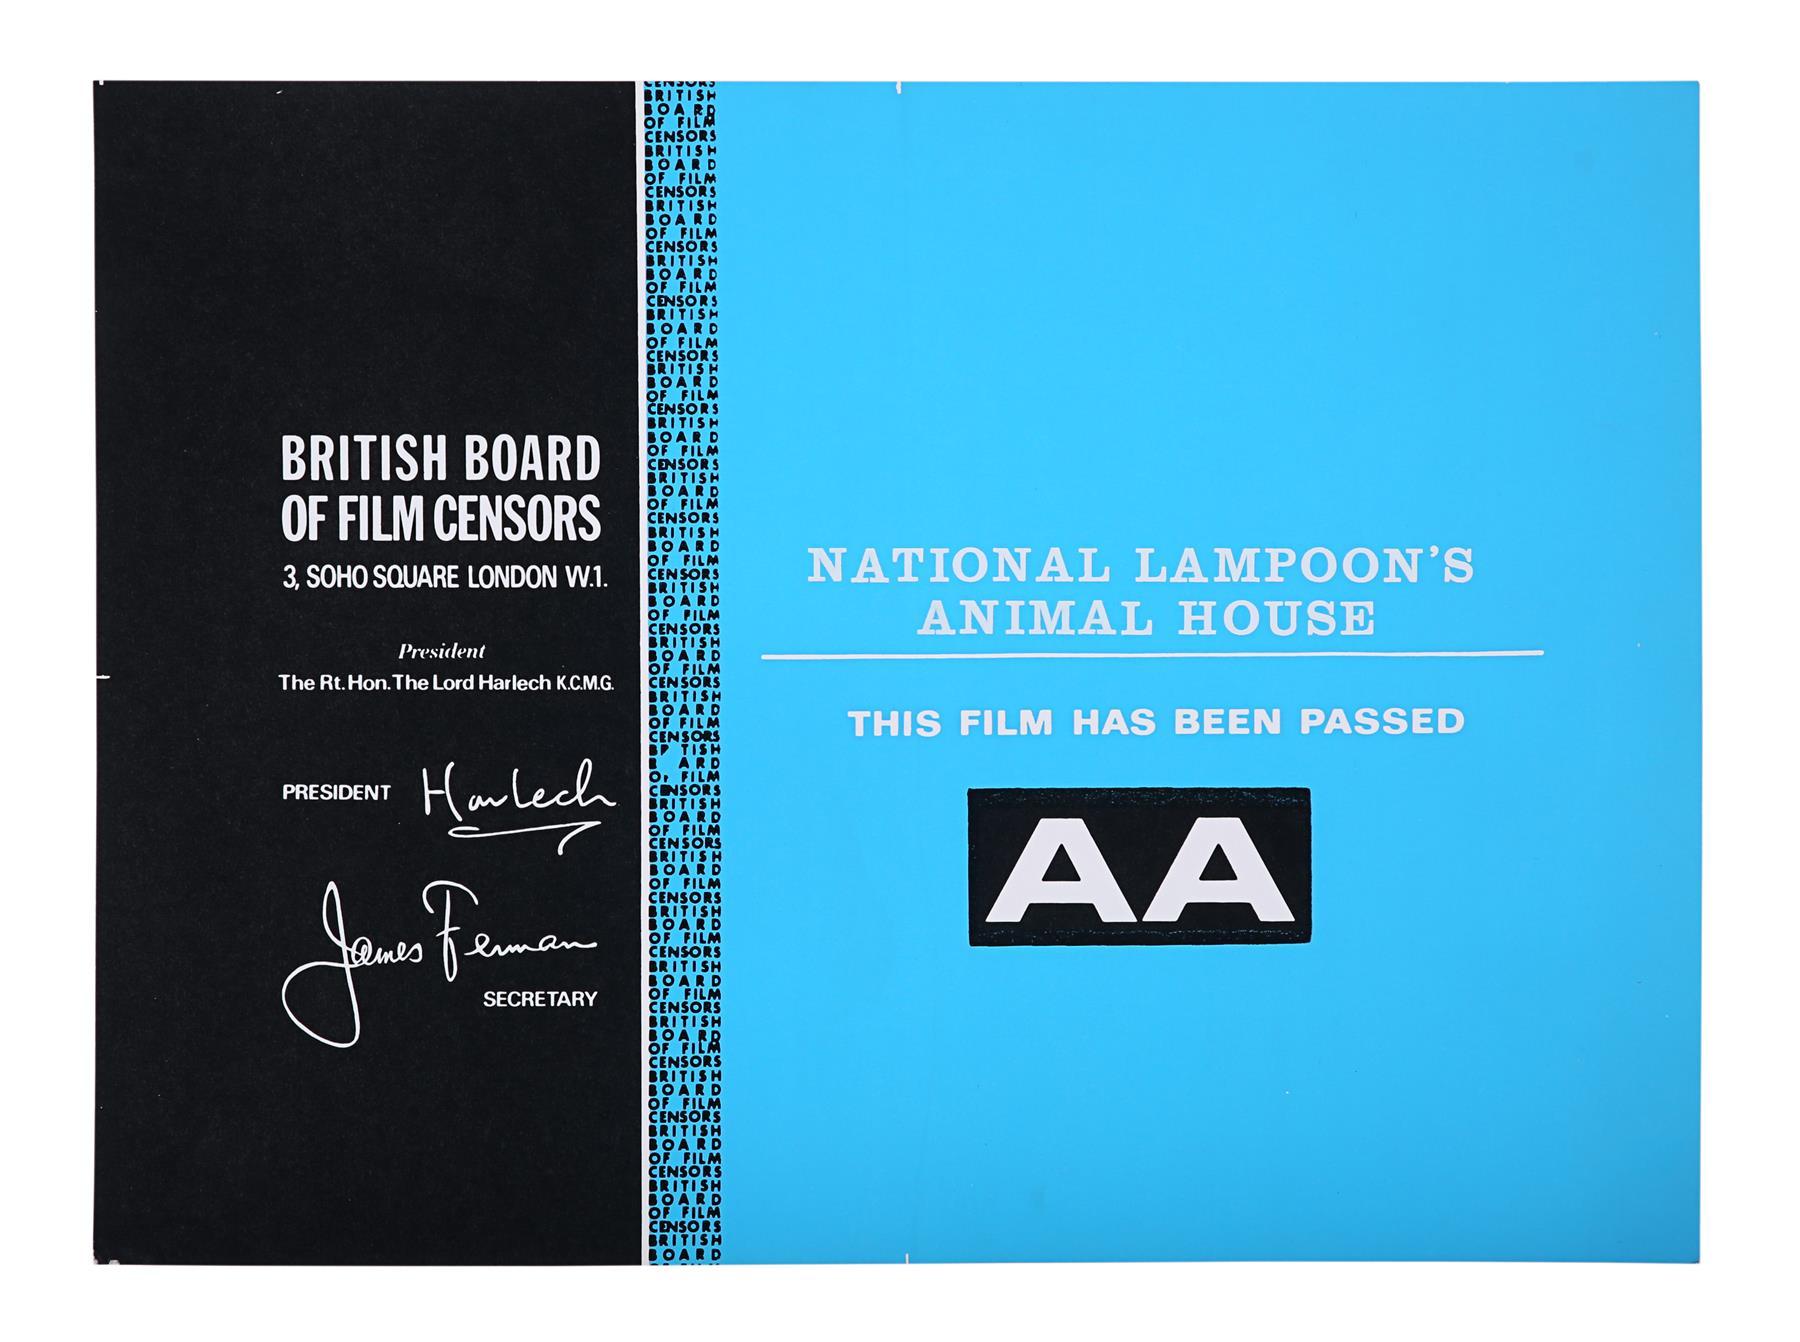 THE BLUES BROTHERS (1980), ANIMAL HOUSE (1978) - BBFC Certificates John Landis, 1978, 1980 - Image 2 of 3